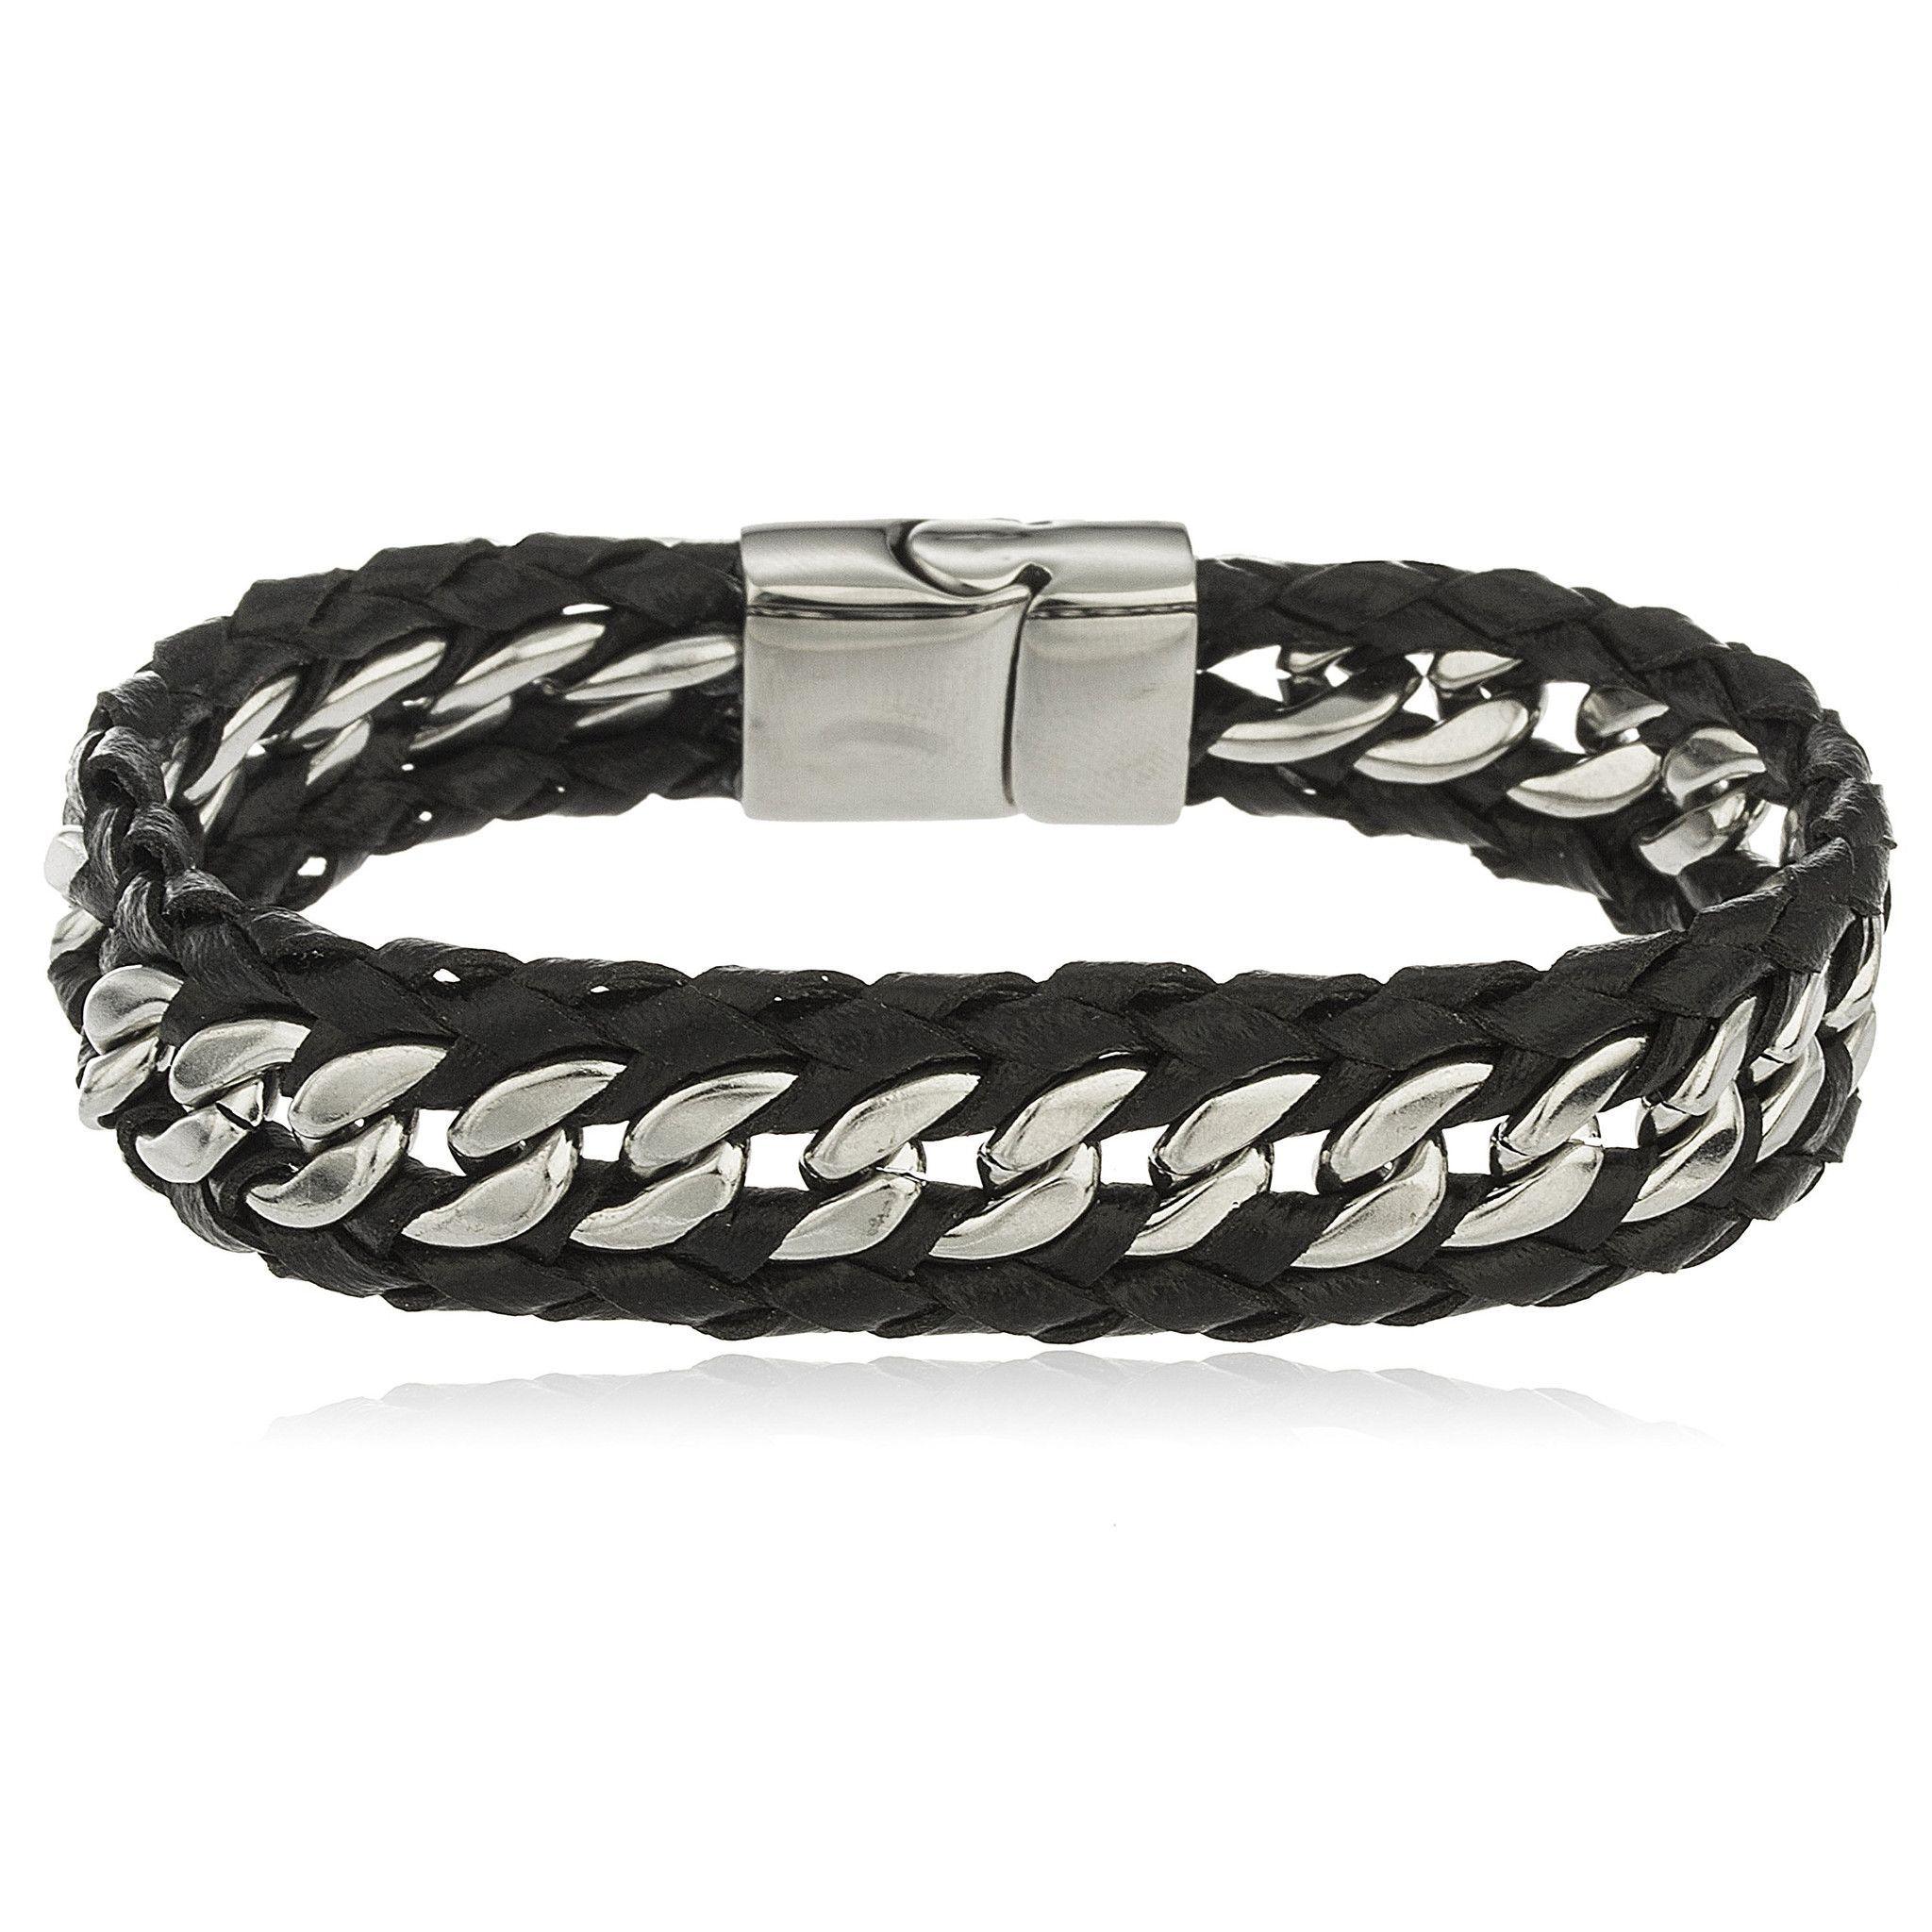 Fine Jewelry Mens Stainless Steel Braided Chain Bracelet Q6kfJJ